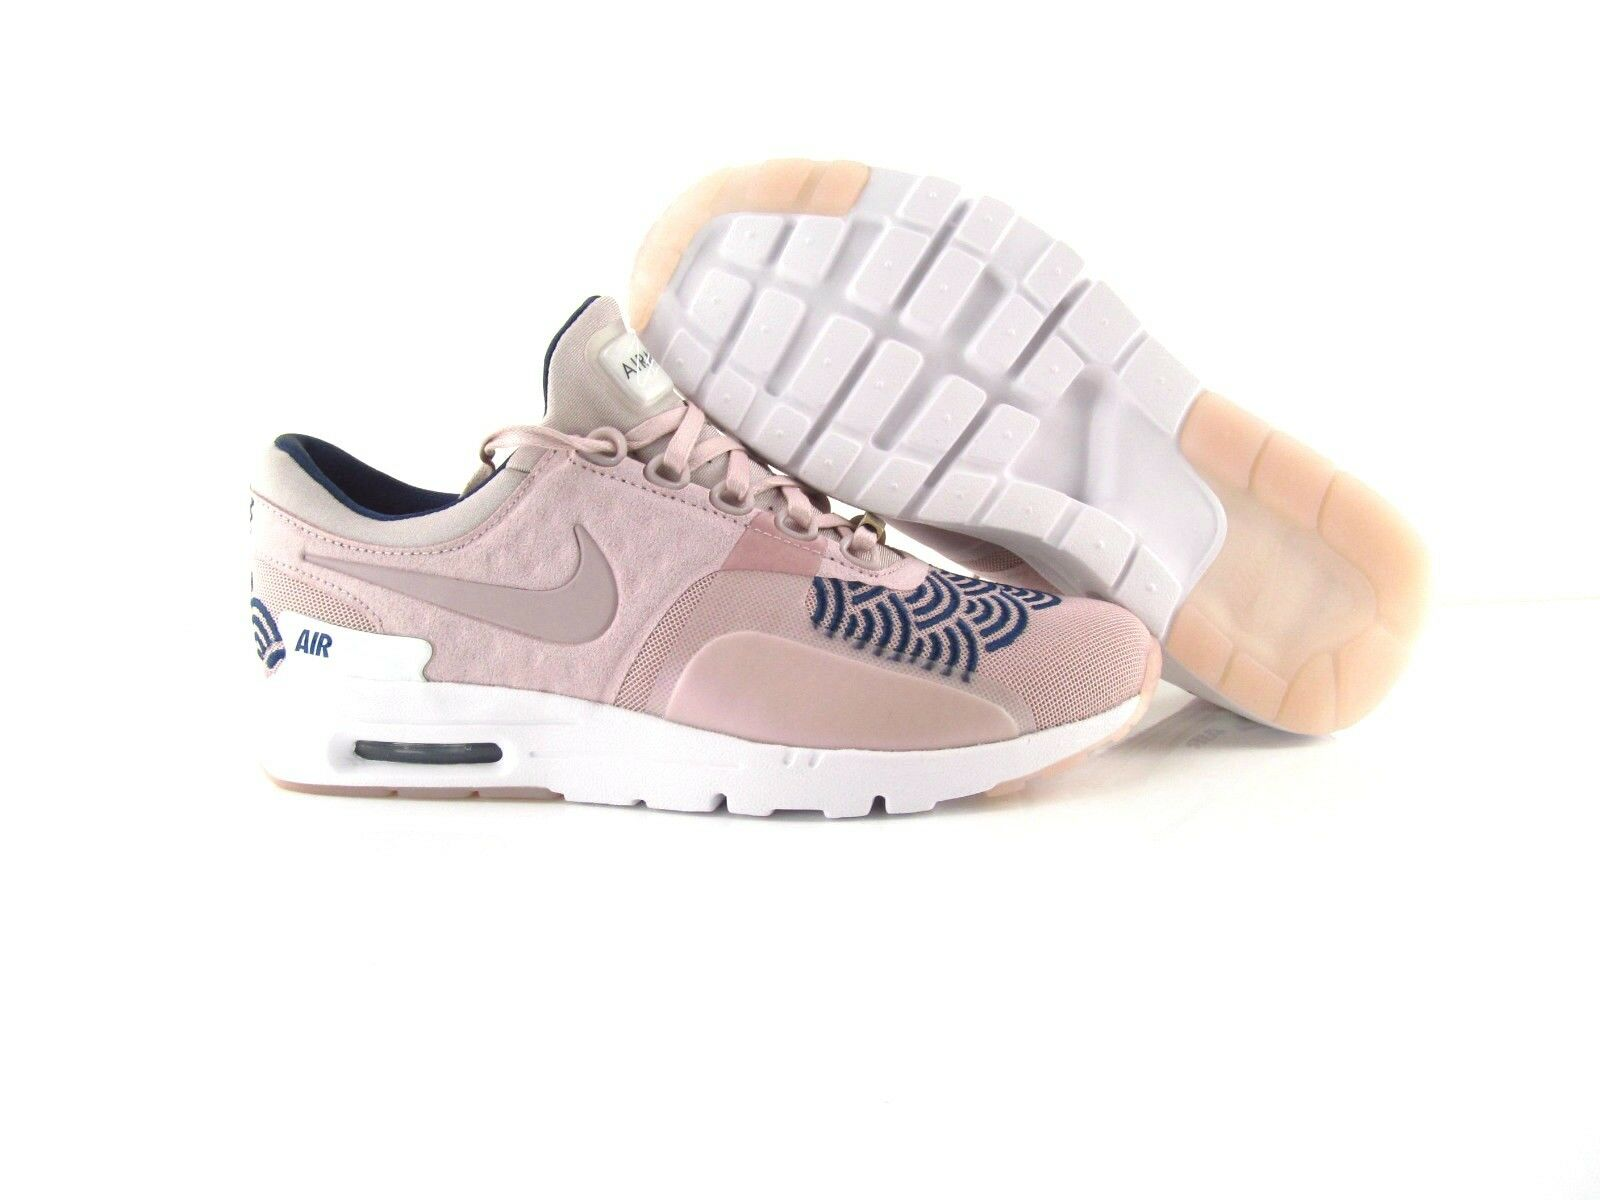 Nike W Air Max Zero Lotc QS TOKYO Champagne NSW OG New US_7+10 Eur_38 42